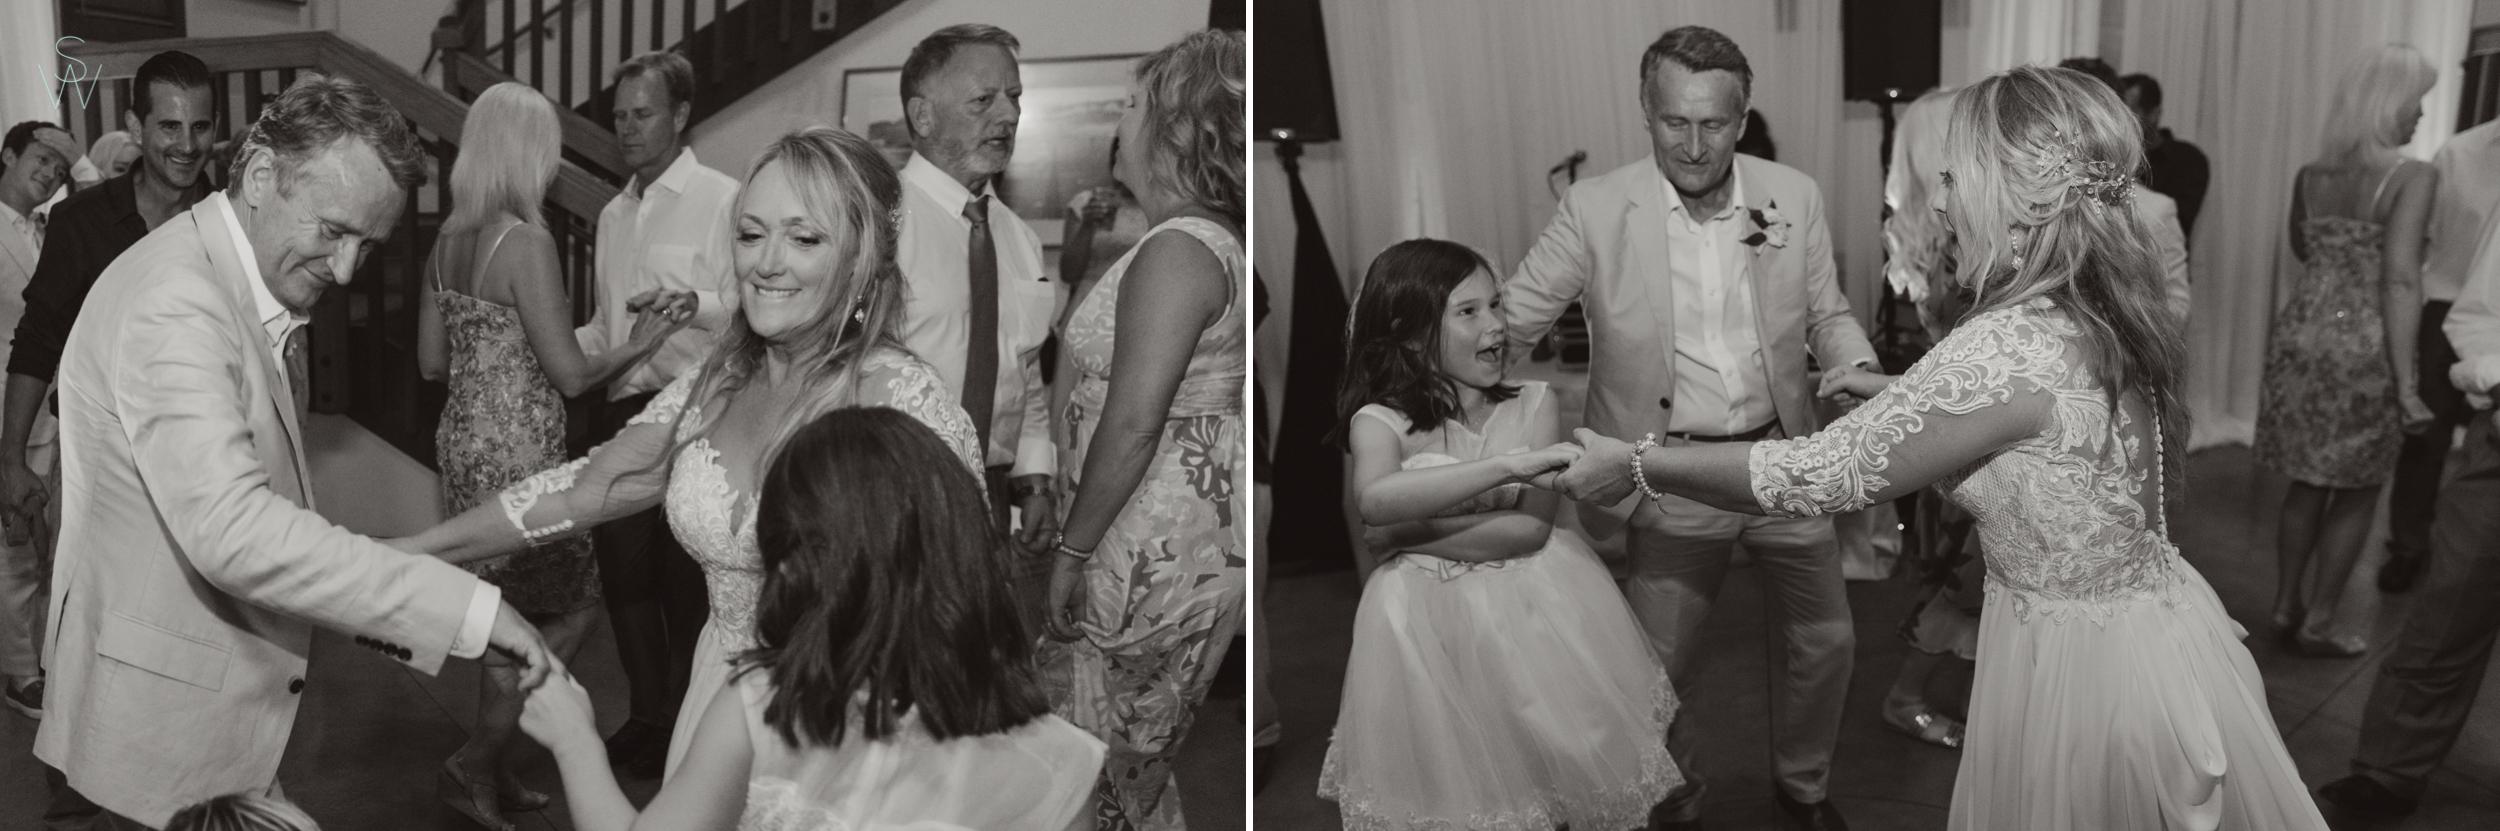 167DEL.MAR.WEDDINGS.photography.shewanders.JPG